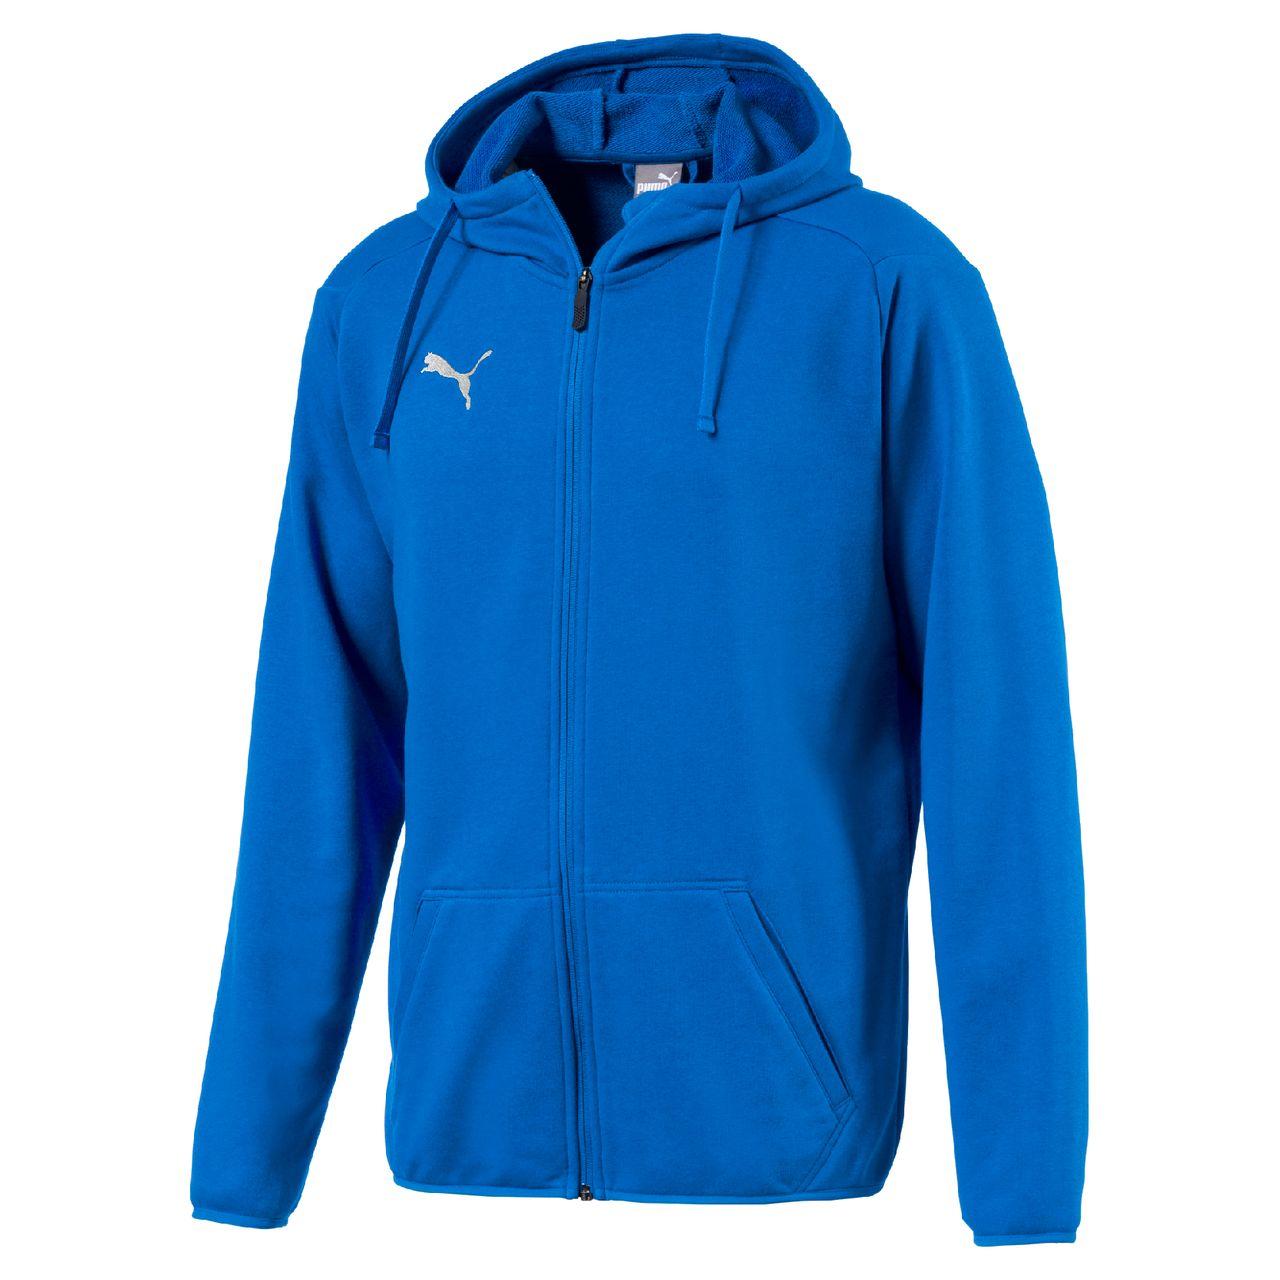 PUMA LIGA Casual Hoody Jacket Teambekleidung   Spielerbekleidung 0a768cc472